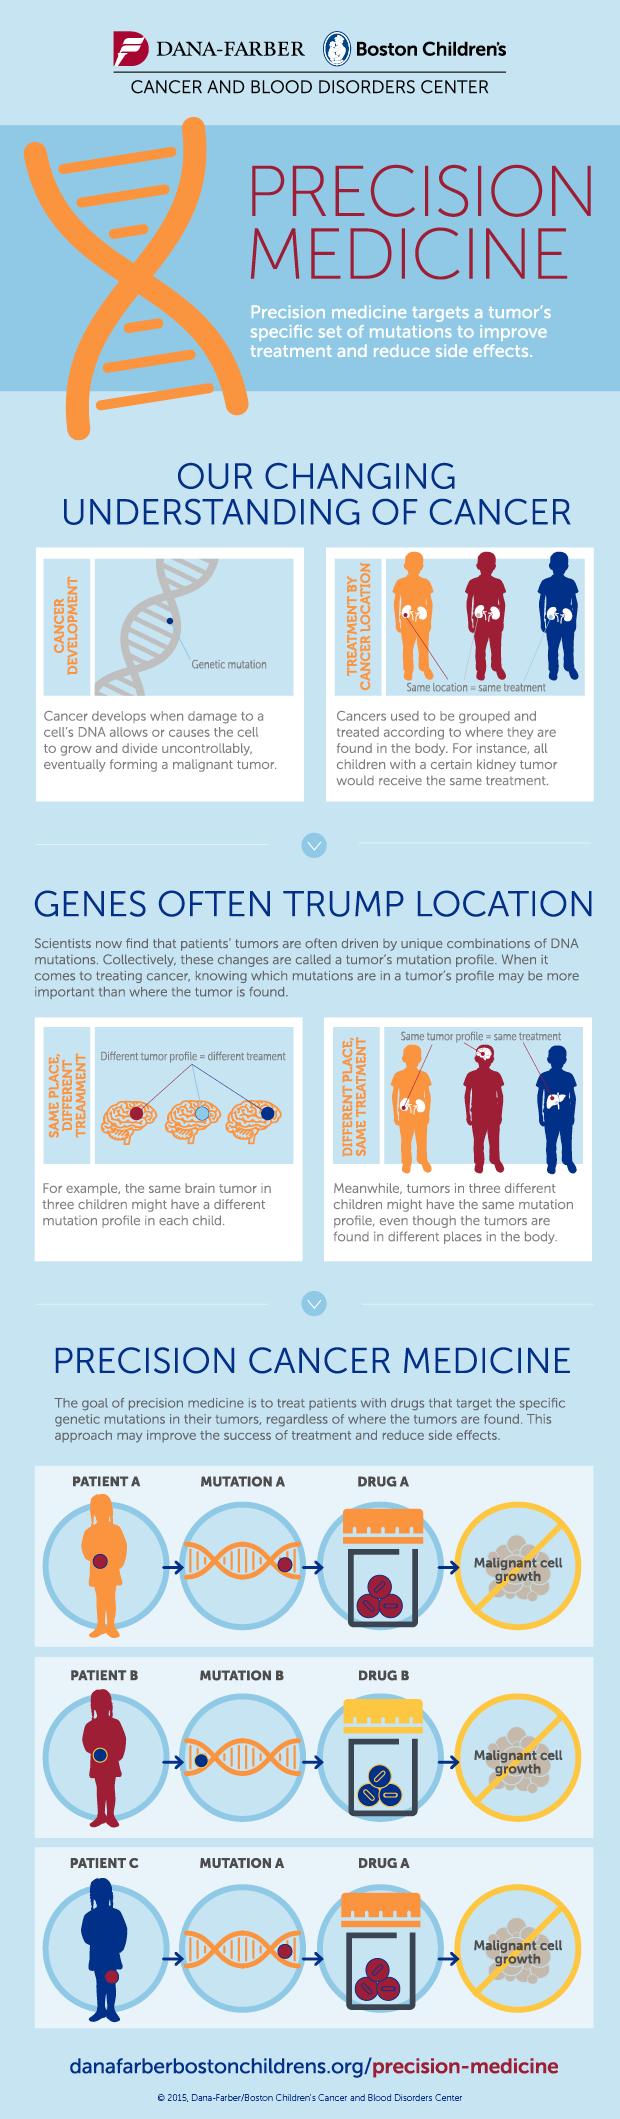 Precision Medicine Infographic.png